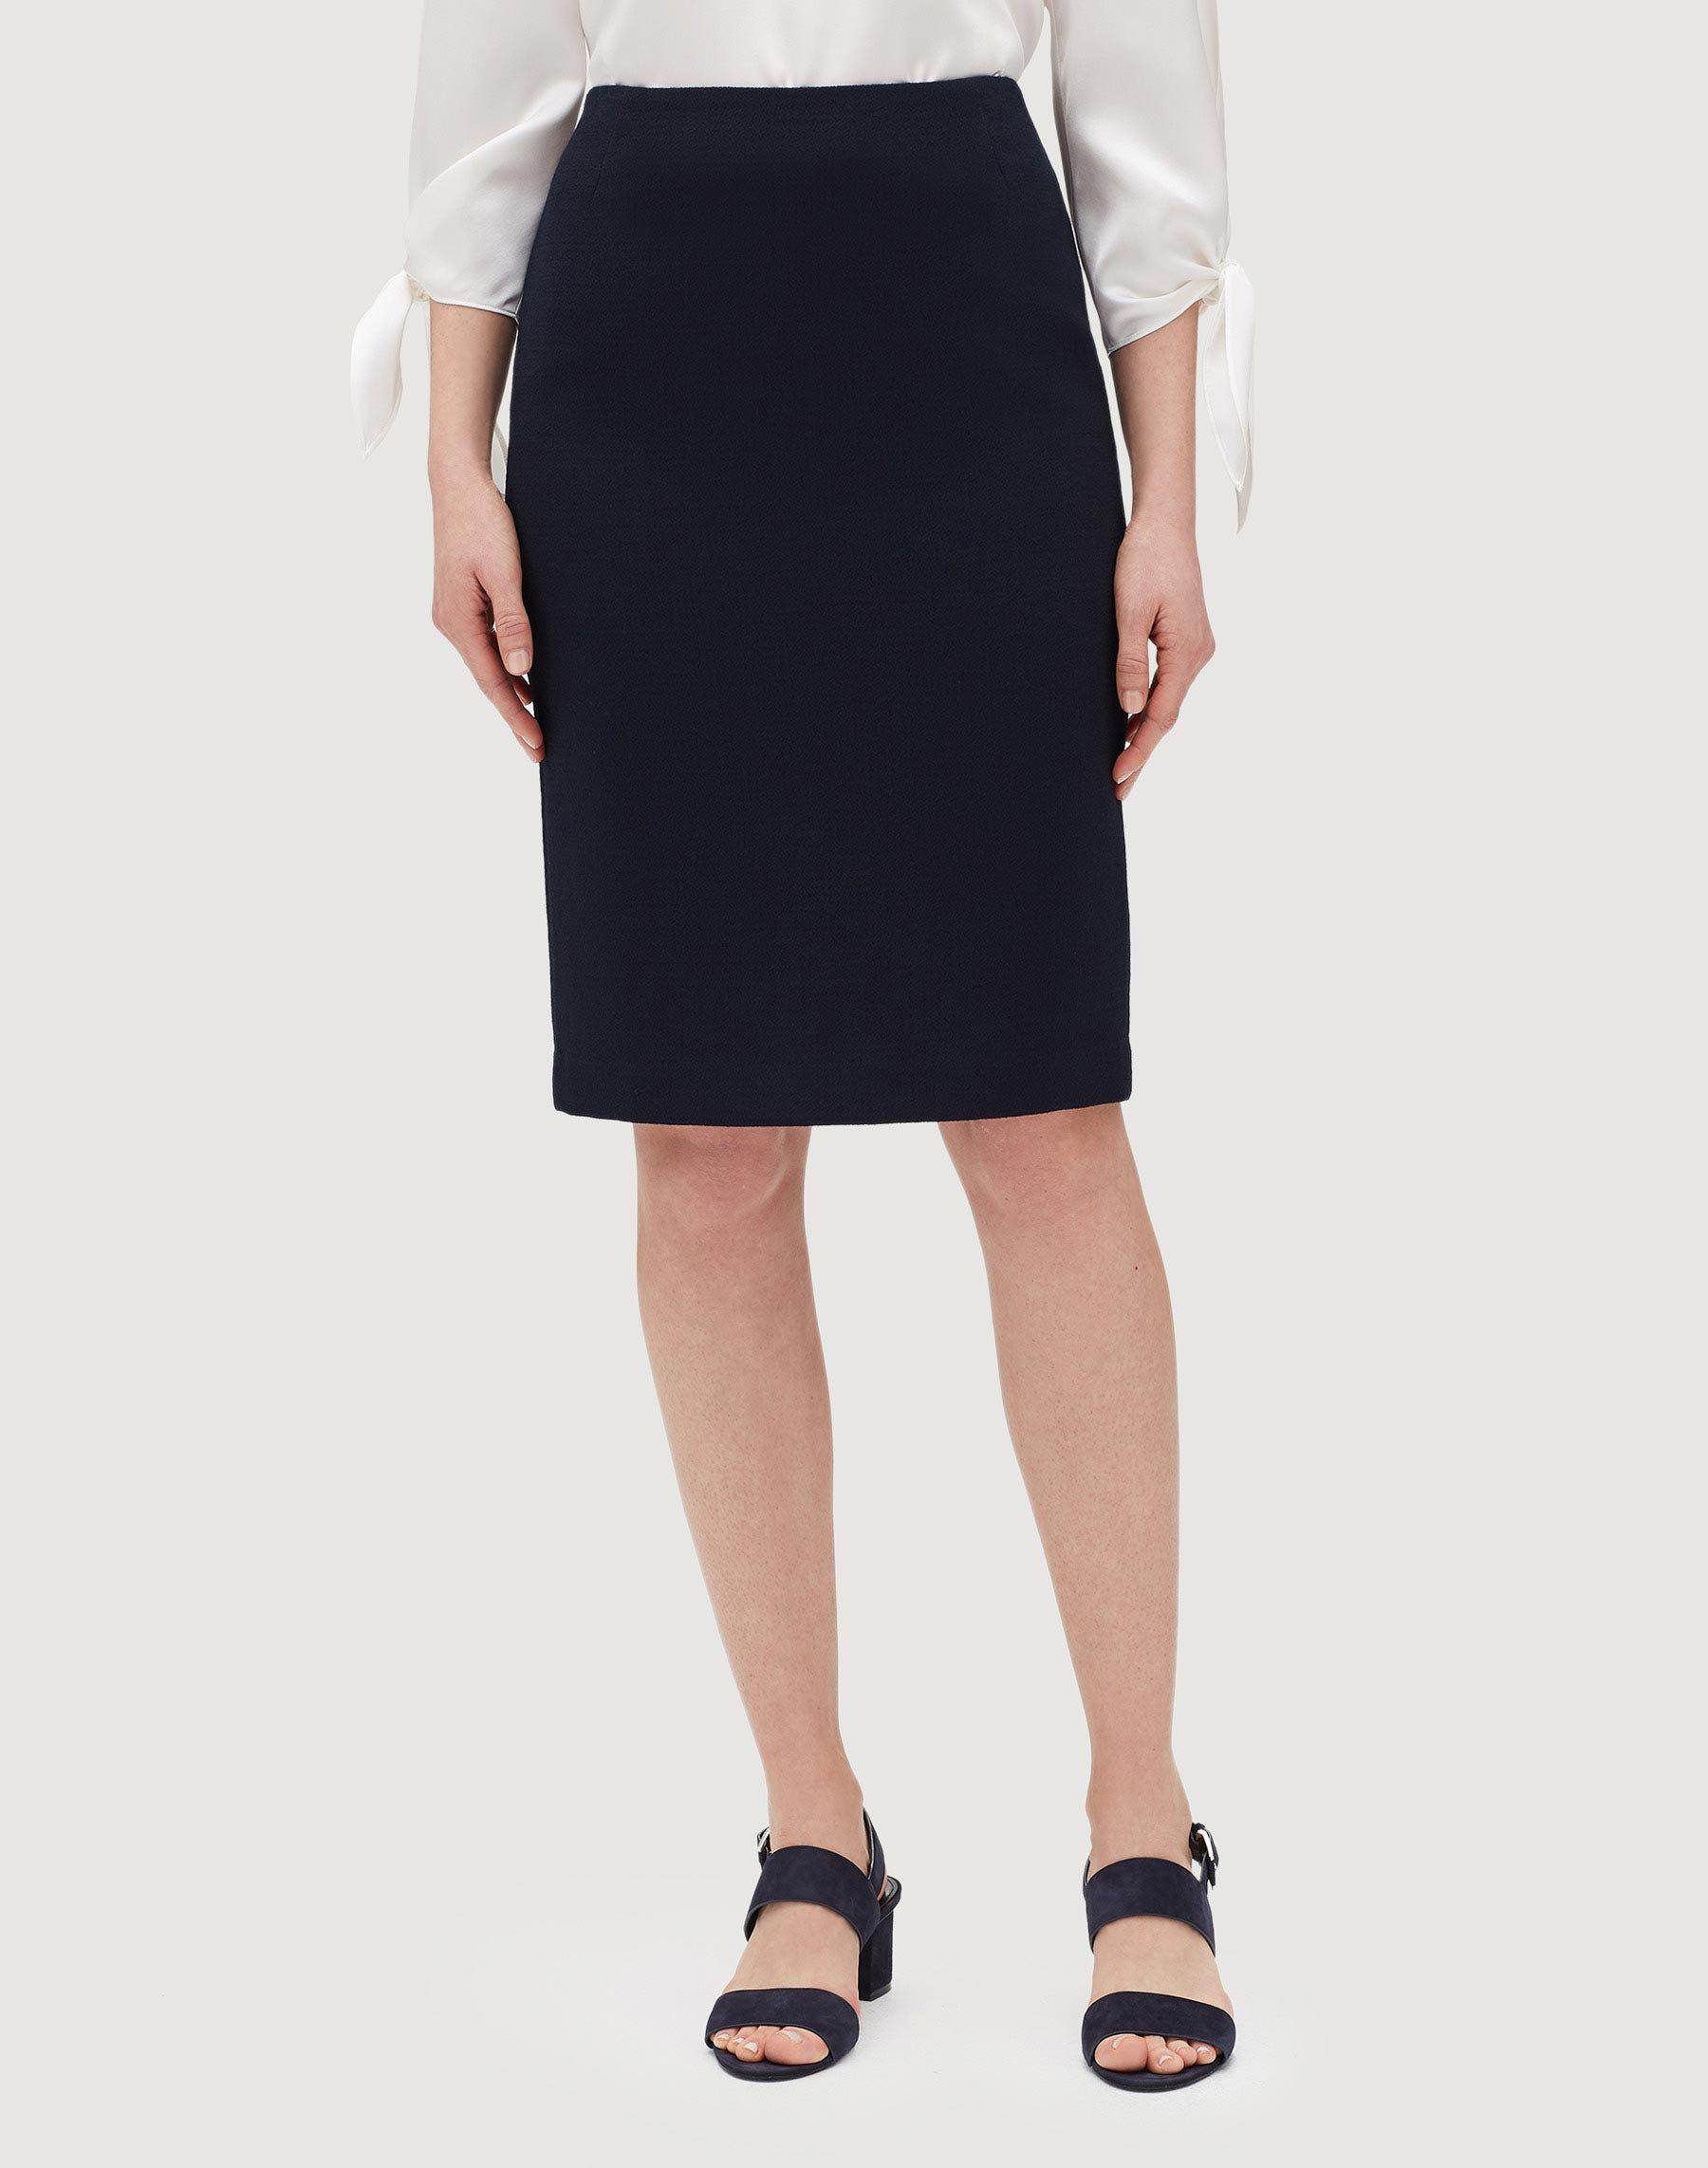 Women's Clothing Skirts Discreet Ladies Check Pencil Skirt